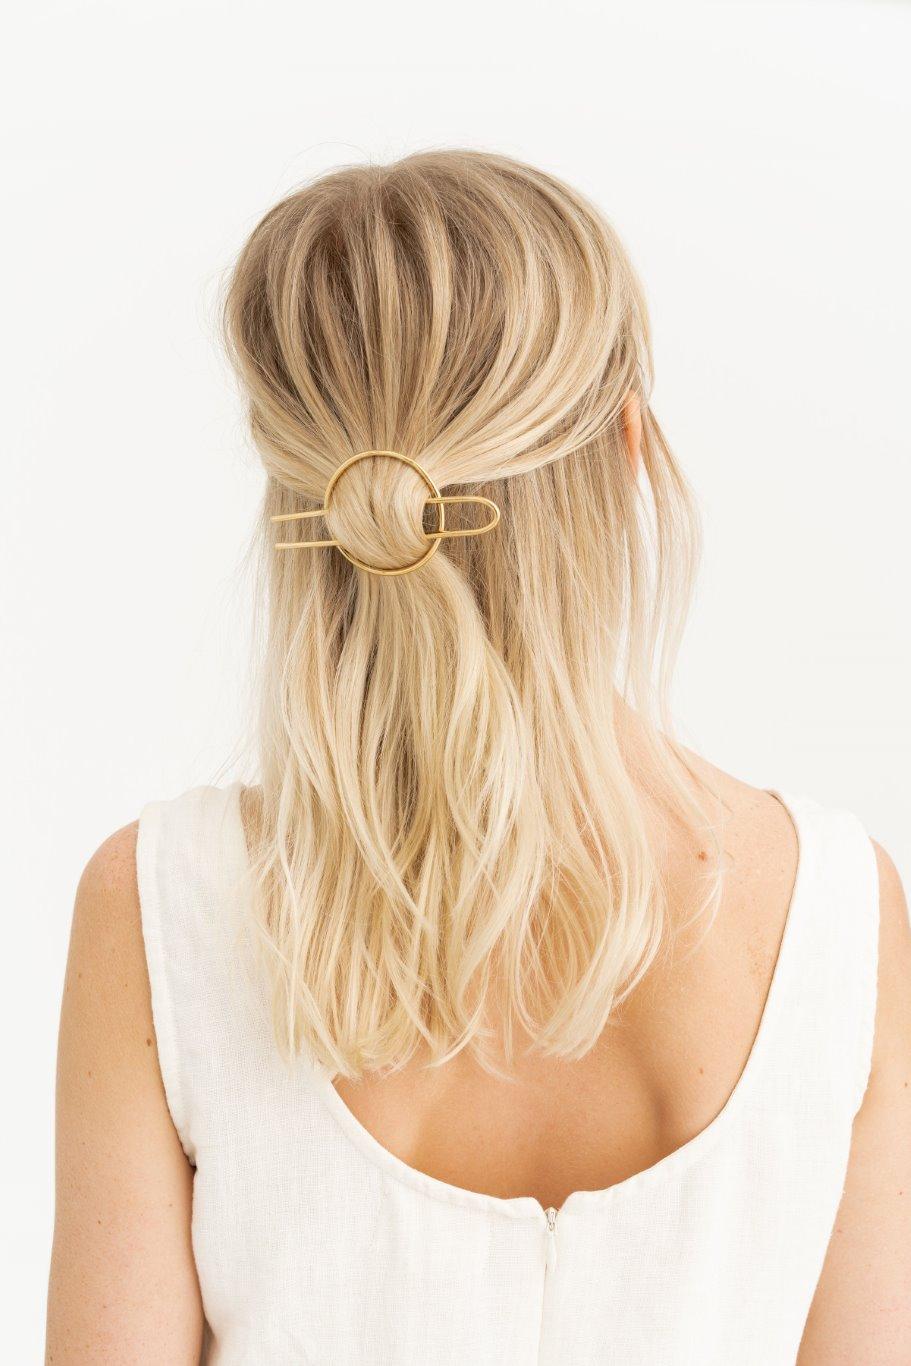 Hair-Pin-1.jpg